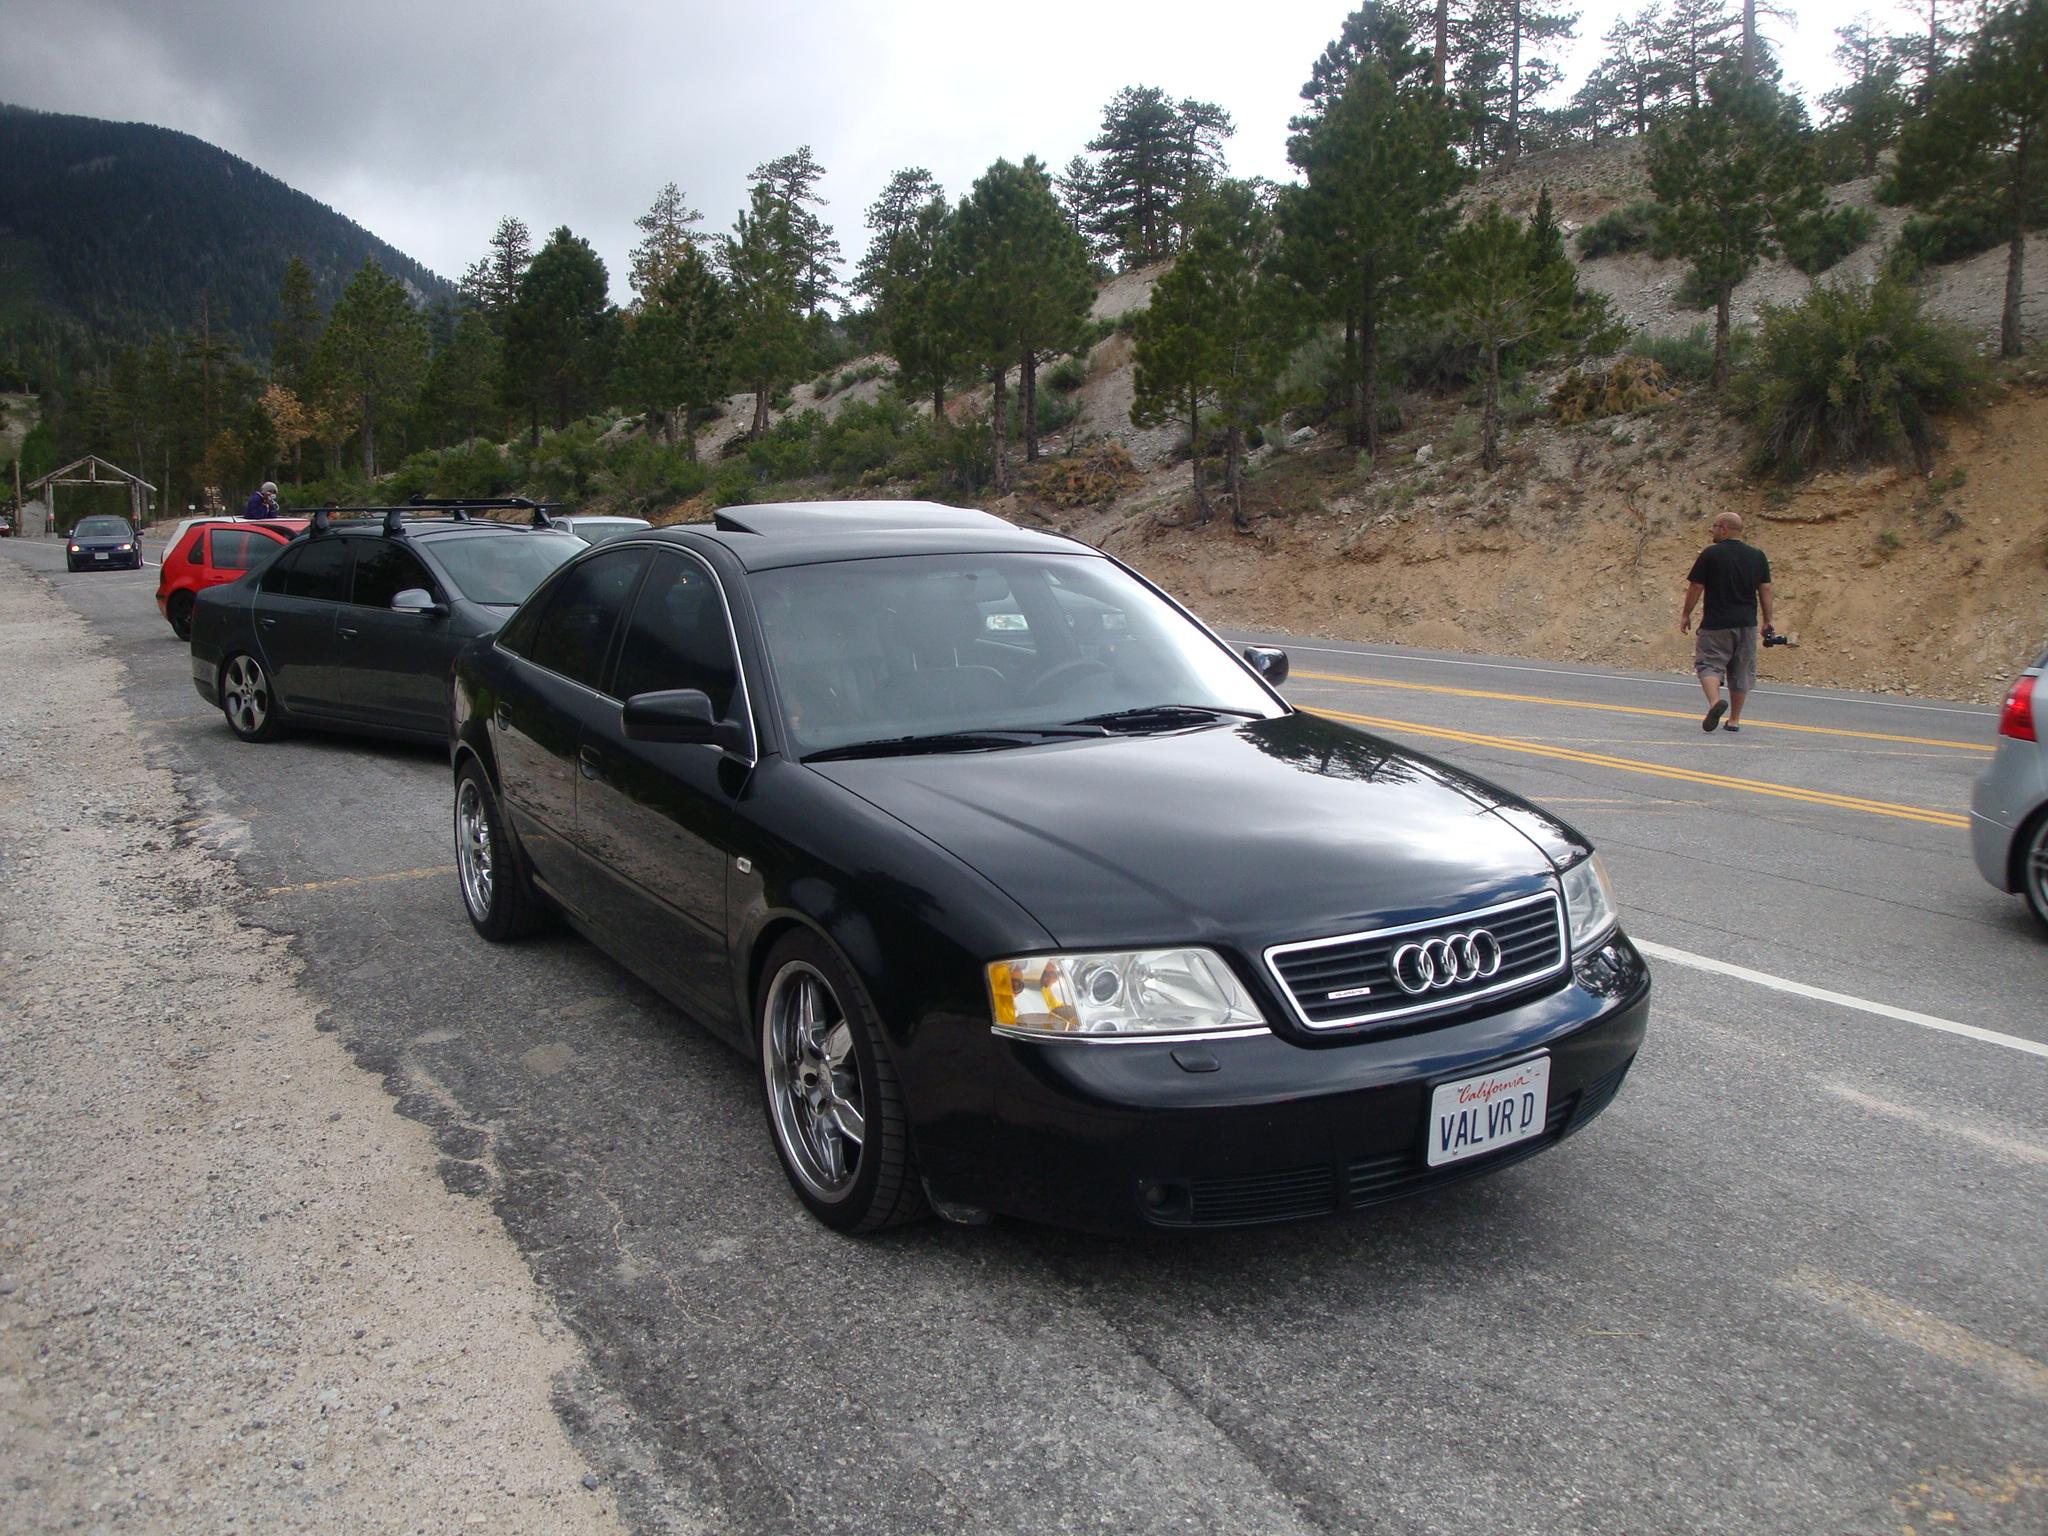 1999 Audi A6 Image 12